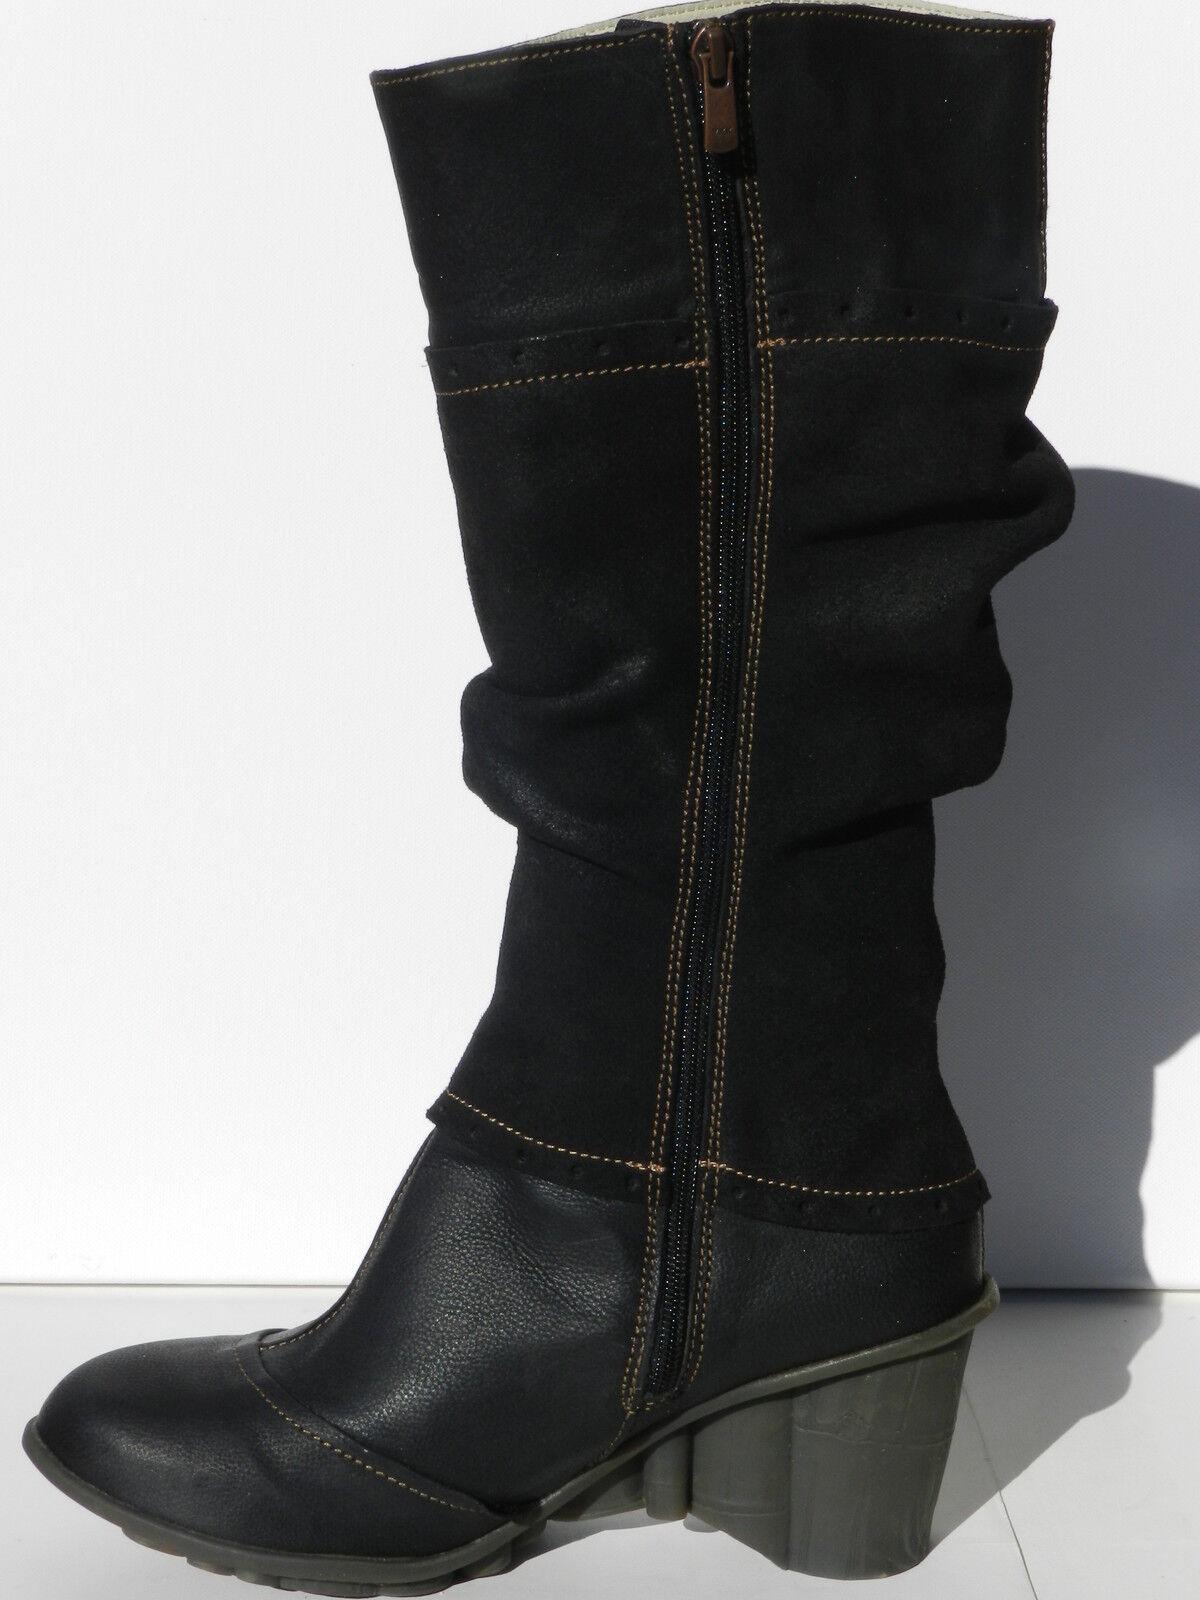 El Naturalista Anji N892 N892 N892 shoes Femme 41 Bottes Tall Boots 892 Cavalière New a812f3